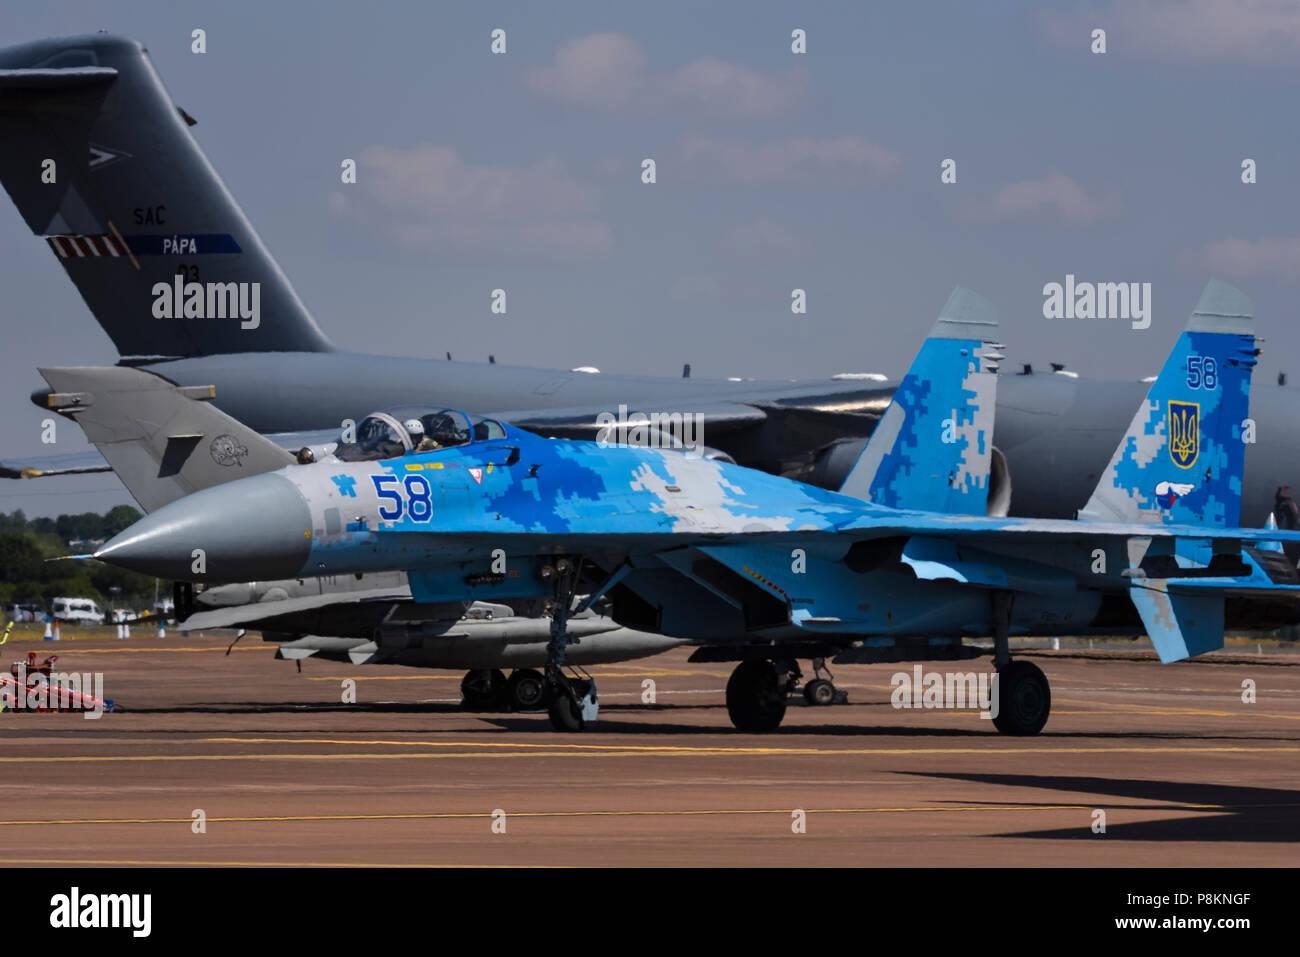 Ukrainian Air Force Sukhoi Su-27 Flanker fighter jet plane - Russian built -  at Royal International Air Tattoo, RIAT 2018, RAF Fairford. - Stock Image